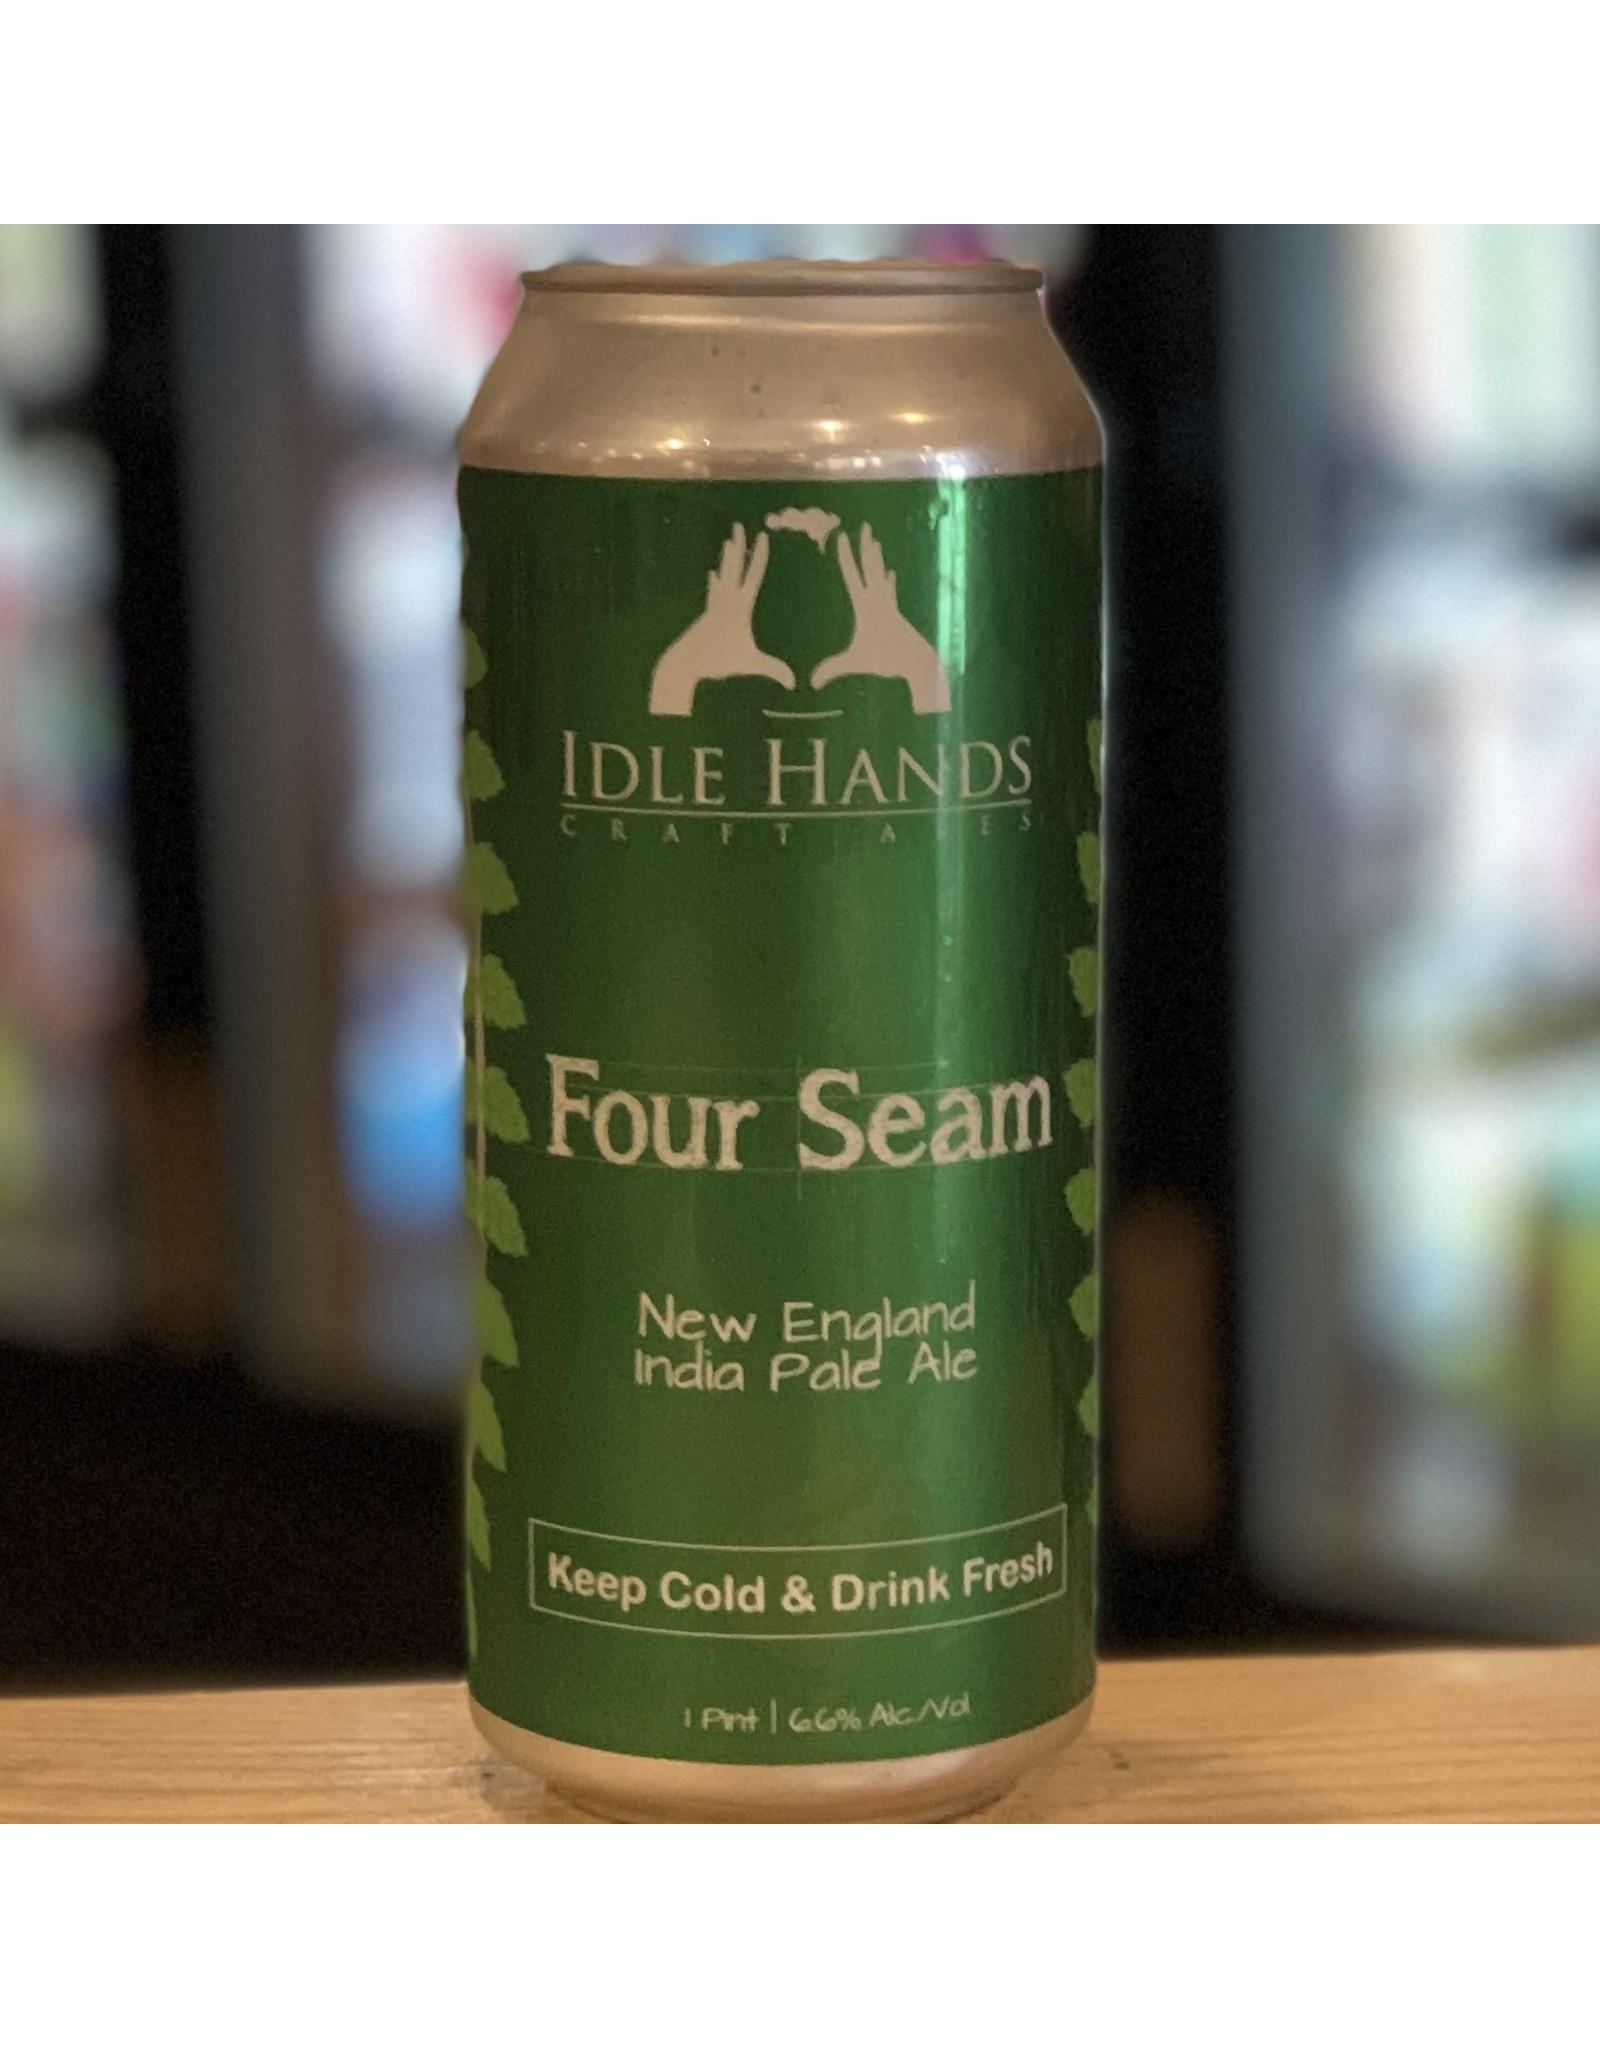 NEIPA Idle Hands ''Four Seam'' NEIPA - Malden, MA